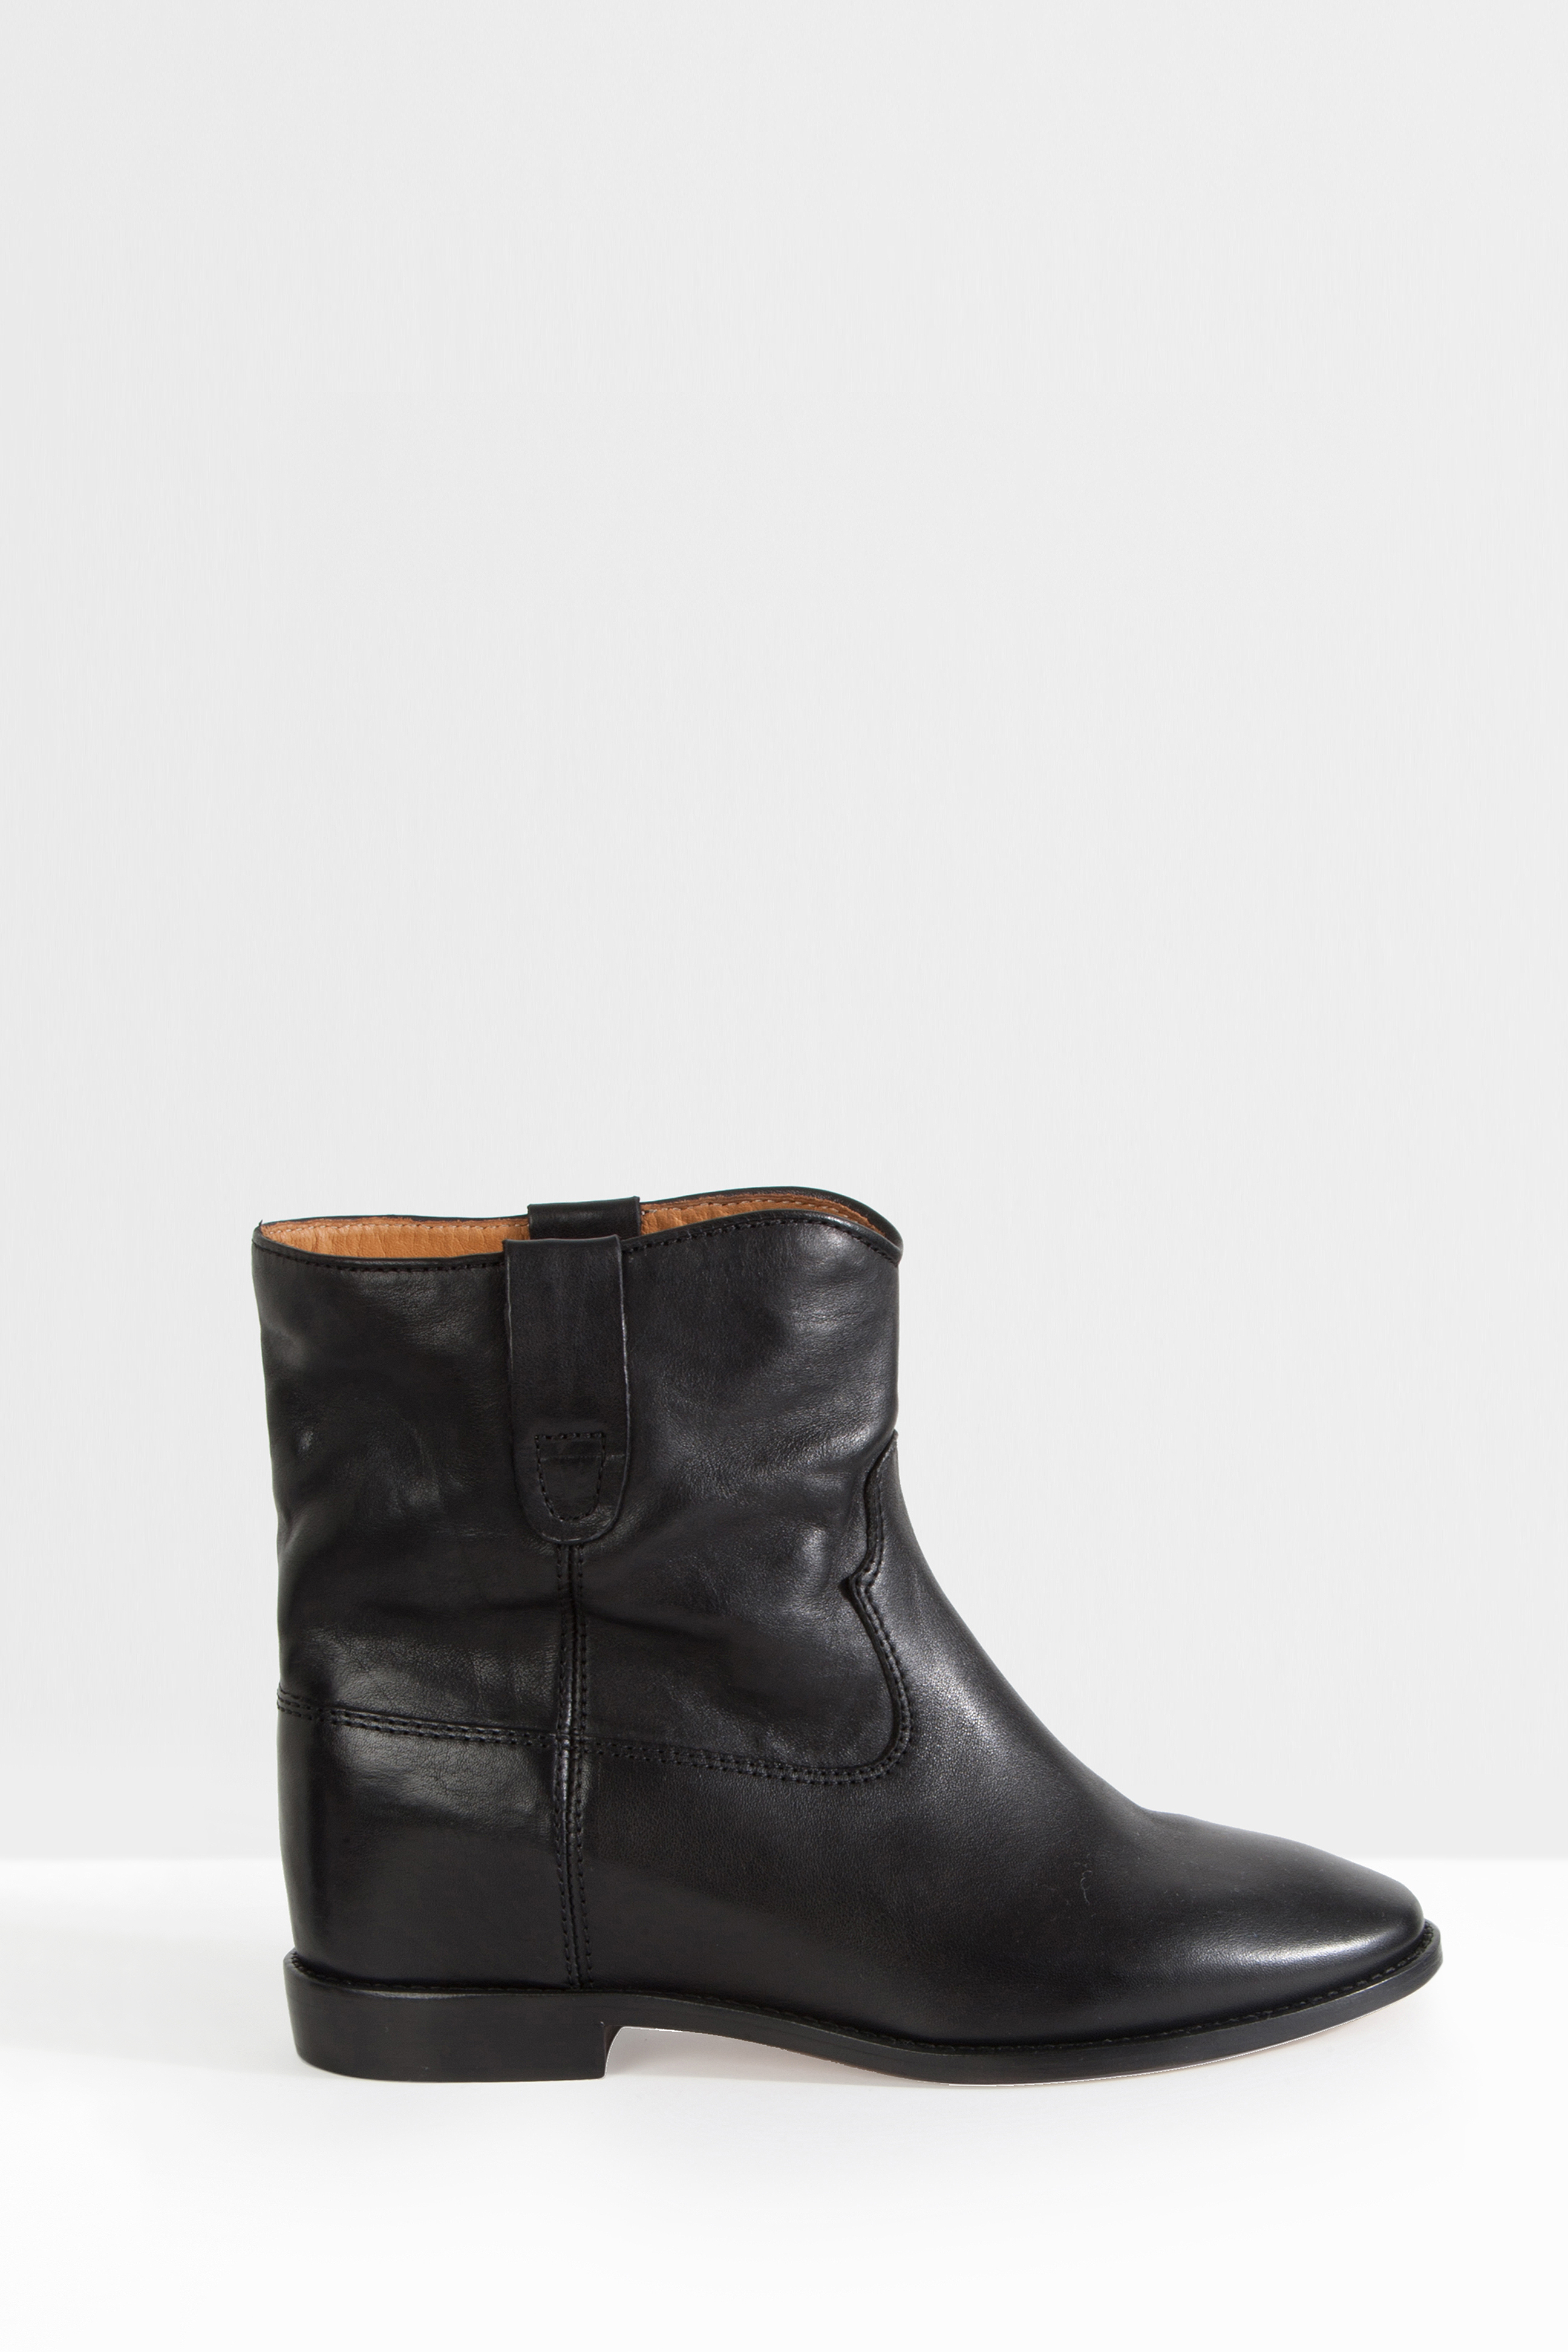 toile isabel marant crisi leather ankle boots in black lyst. Black Bedroom Furniture Sets. Home Design Ideas